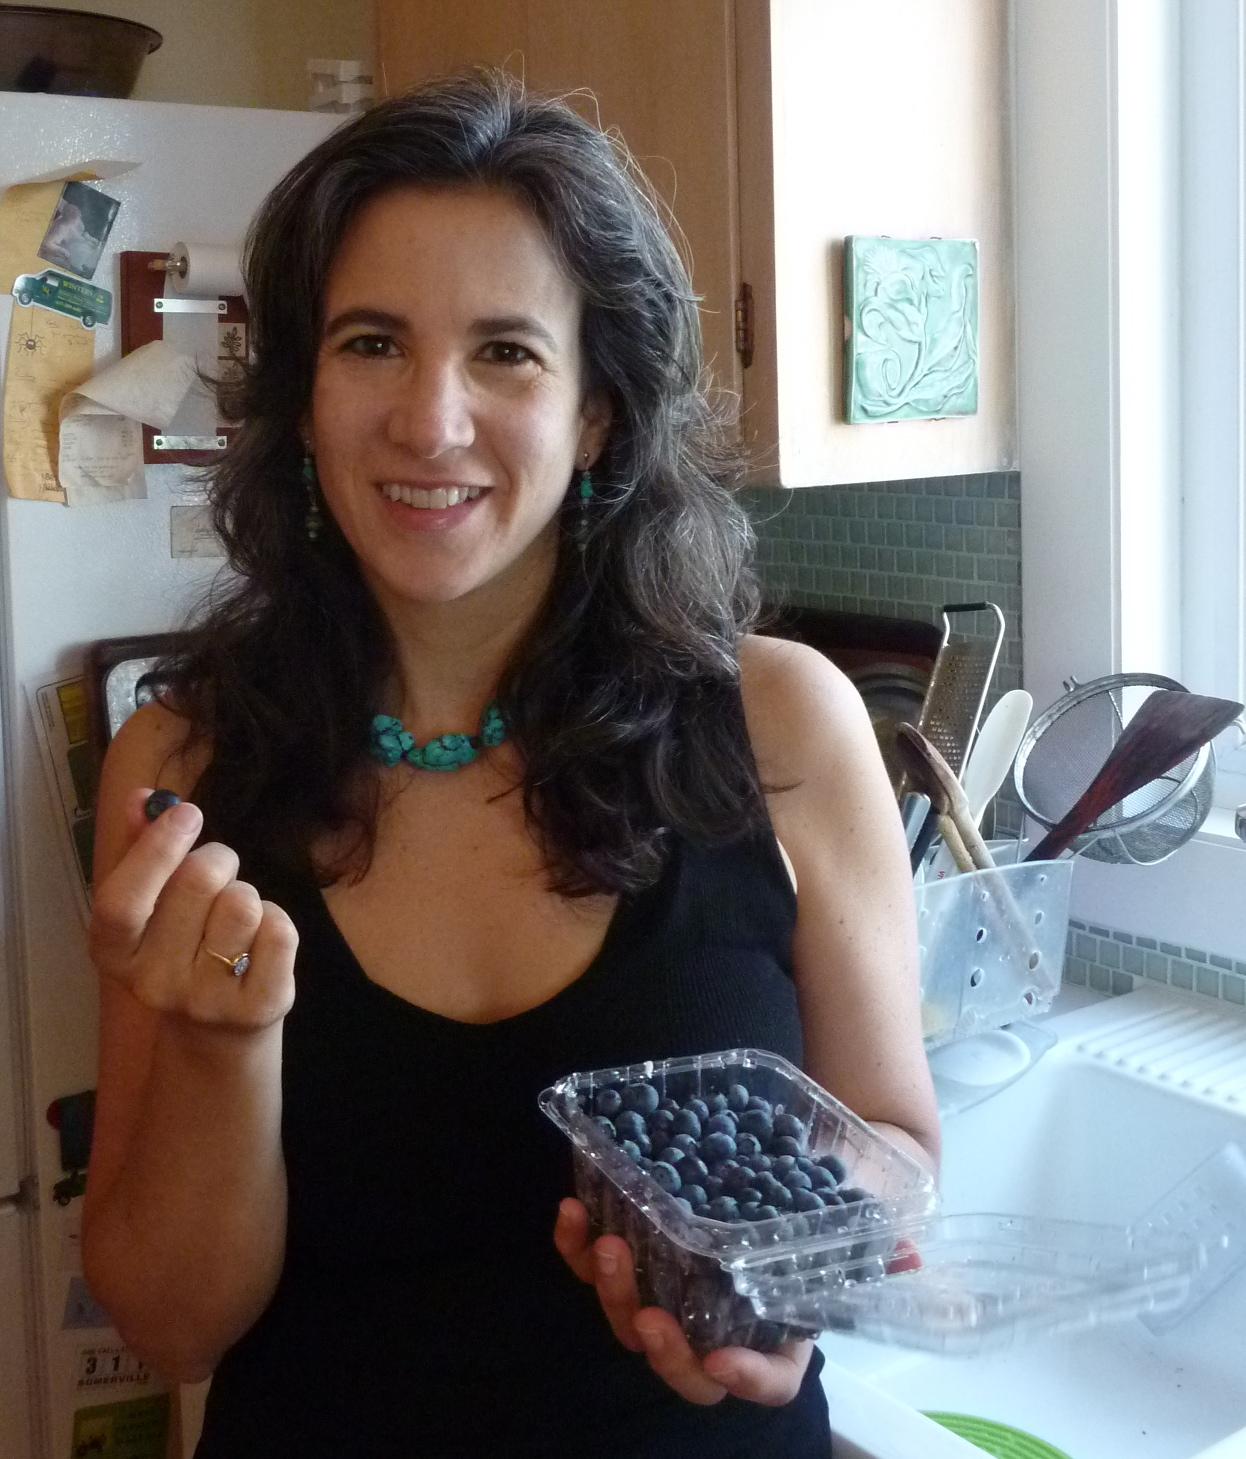 Eating standing at the kitchen counter! - Nina Manolson